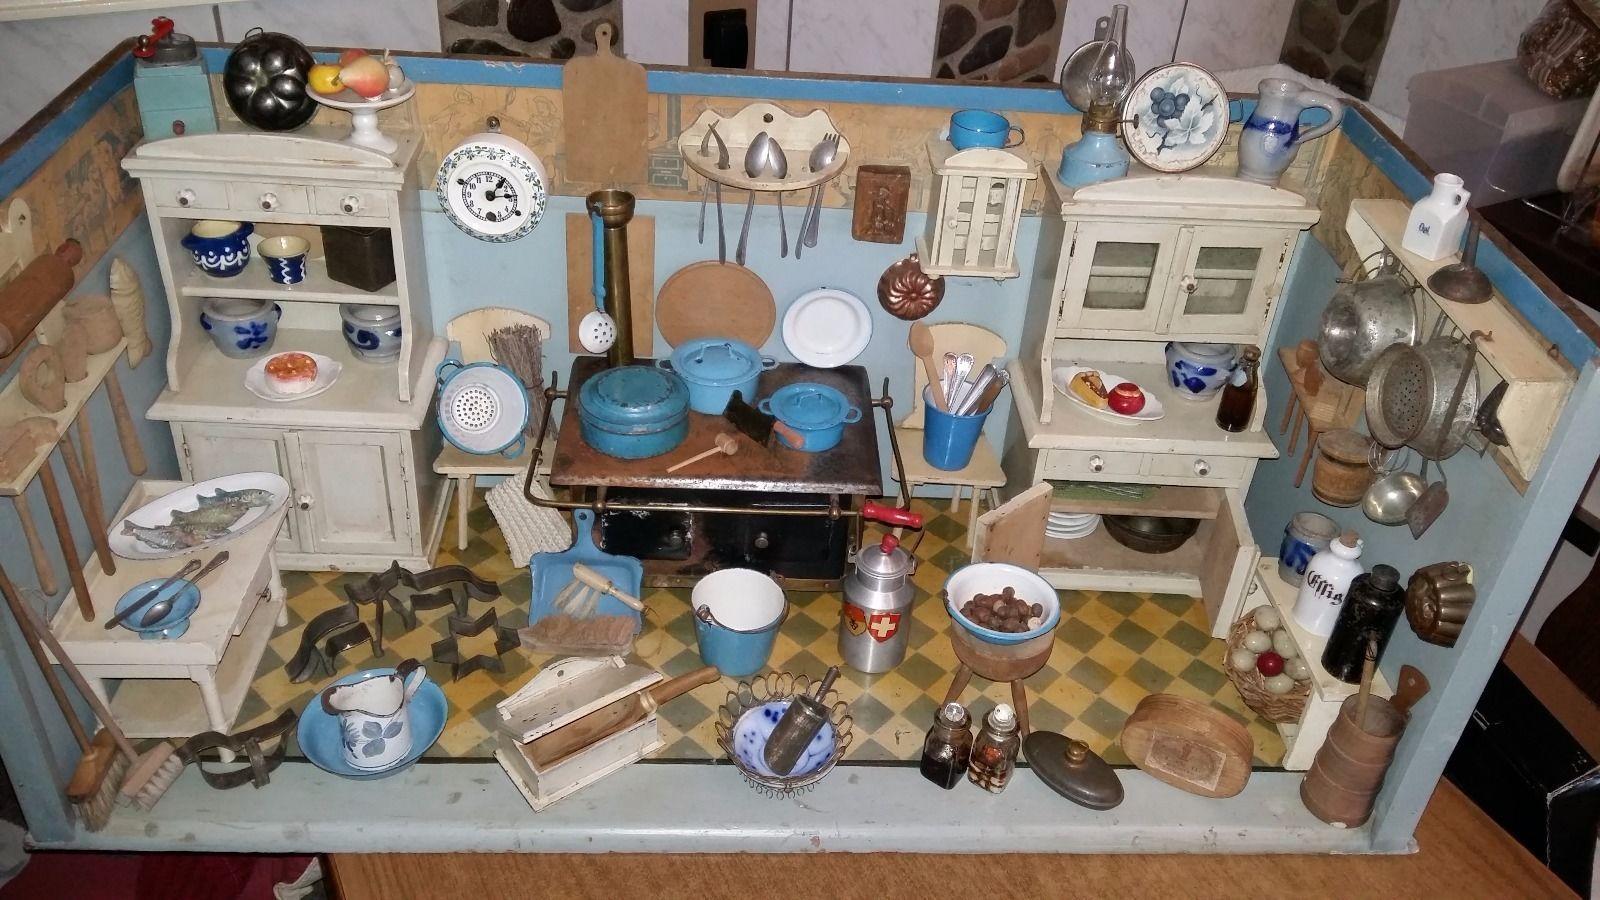 puppenstube k che emaille porzellan holz blech glas schaugerichte antik in antiquit ten kunst. Black Bedroom Furniture Sets. Home Design Ideas